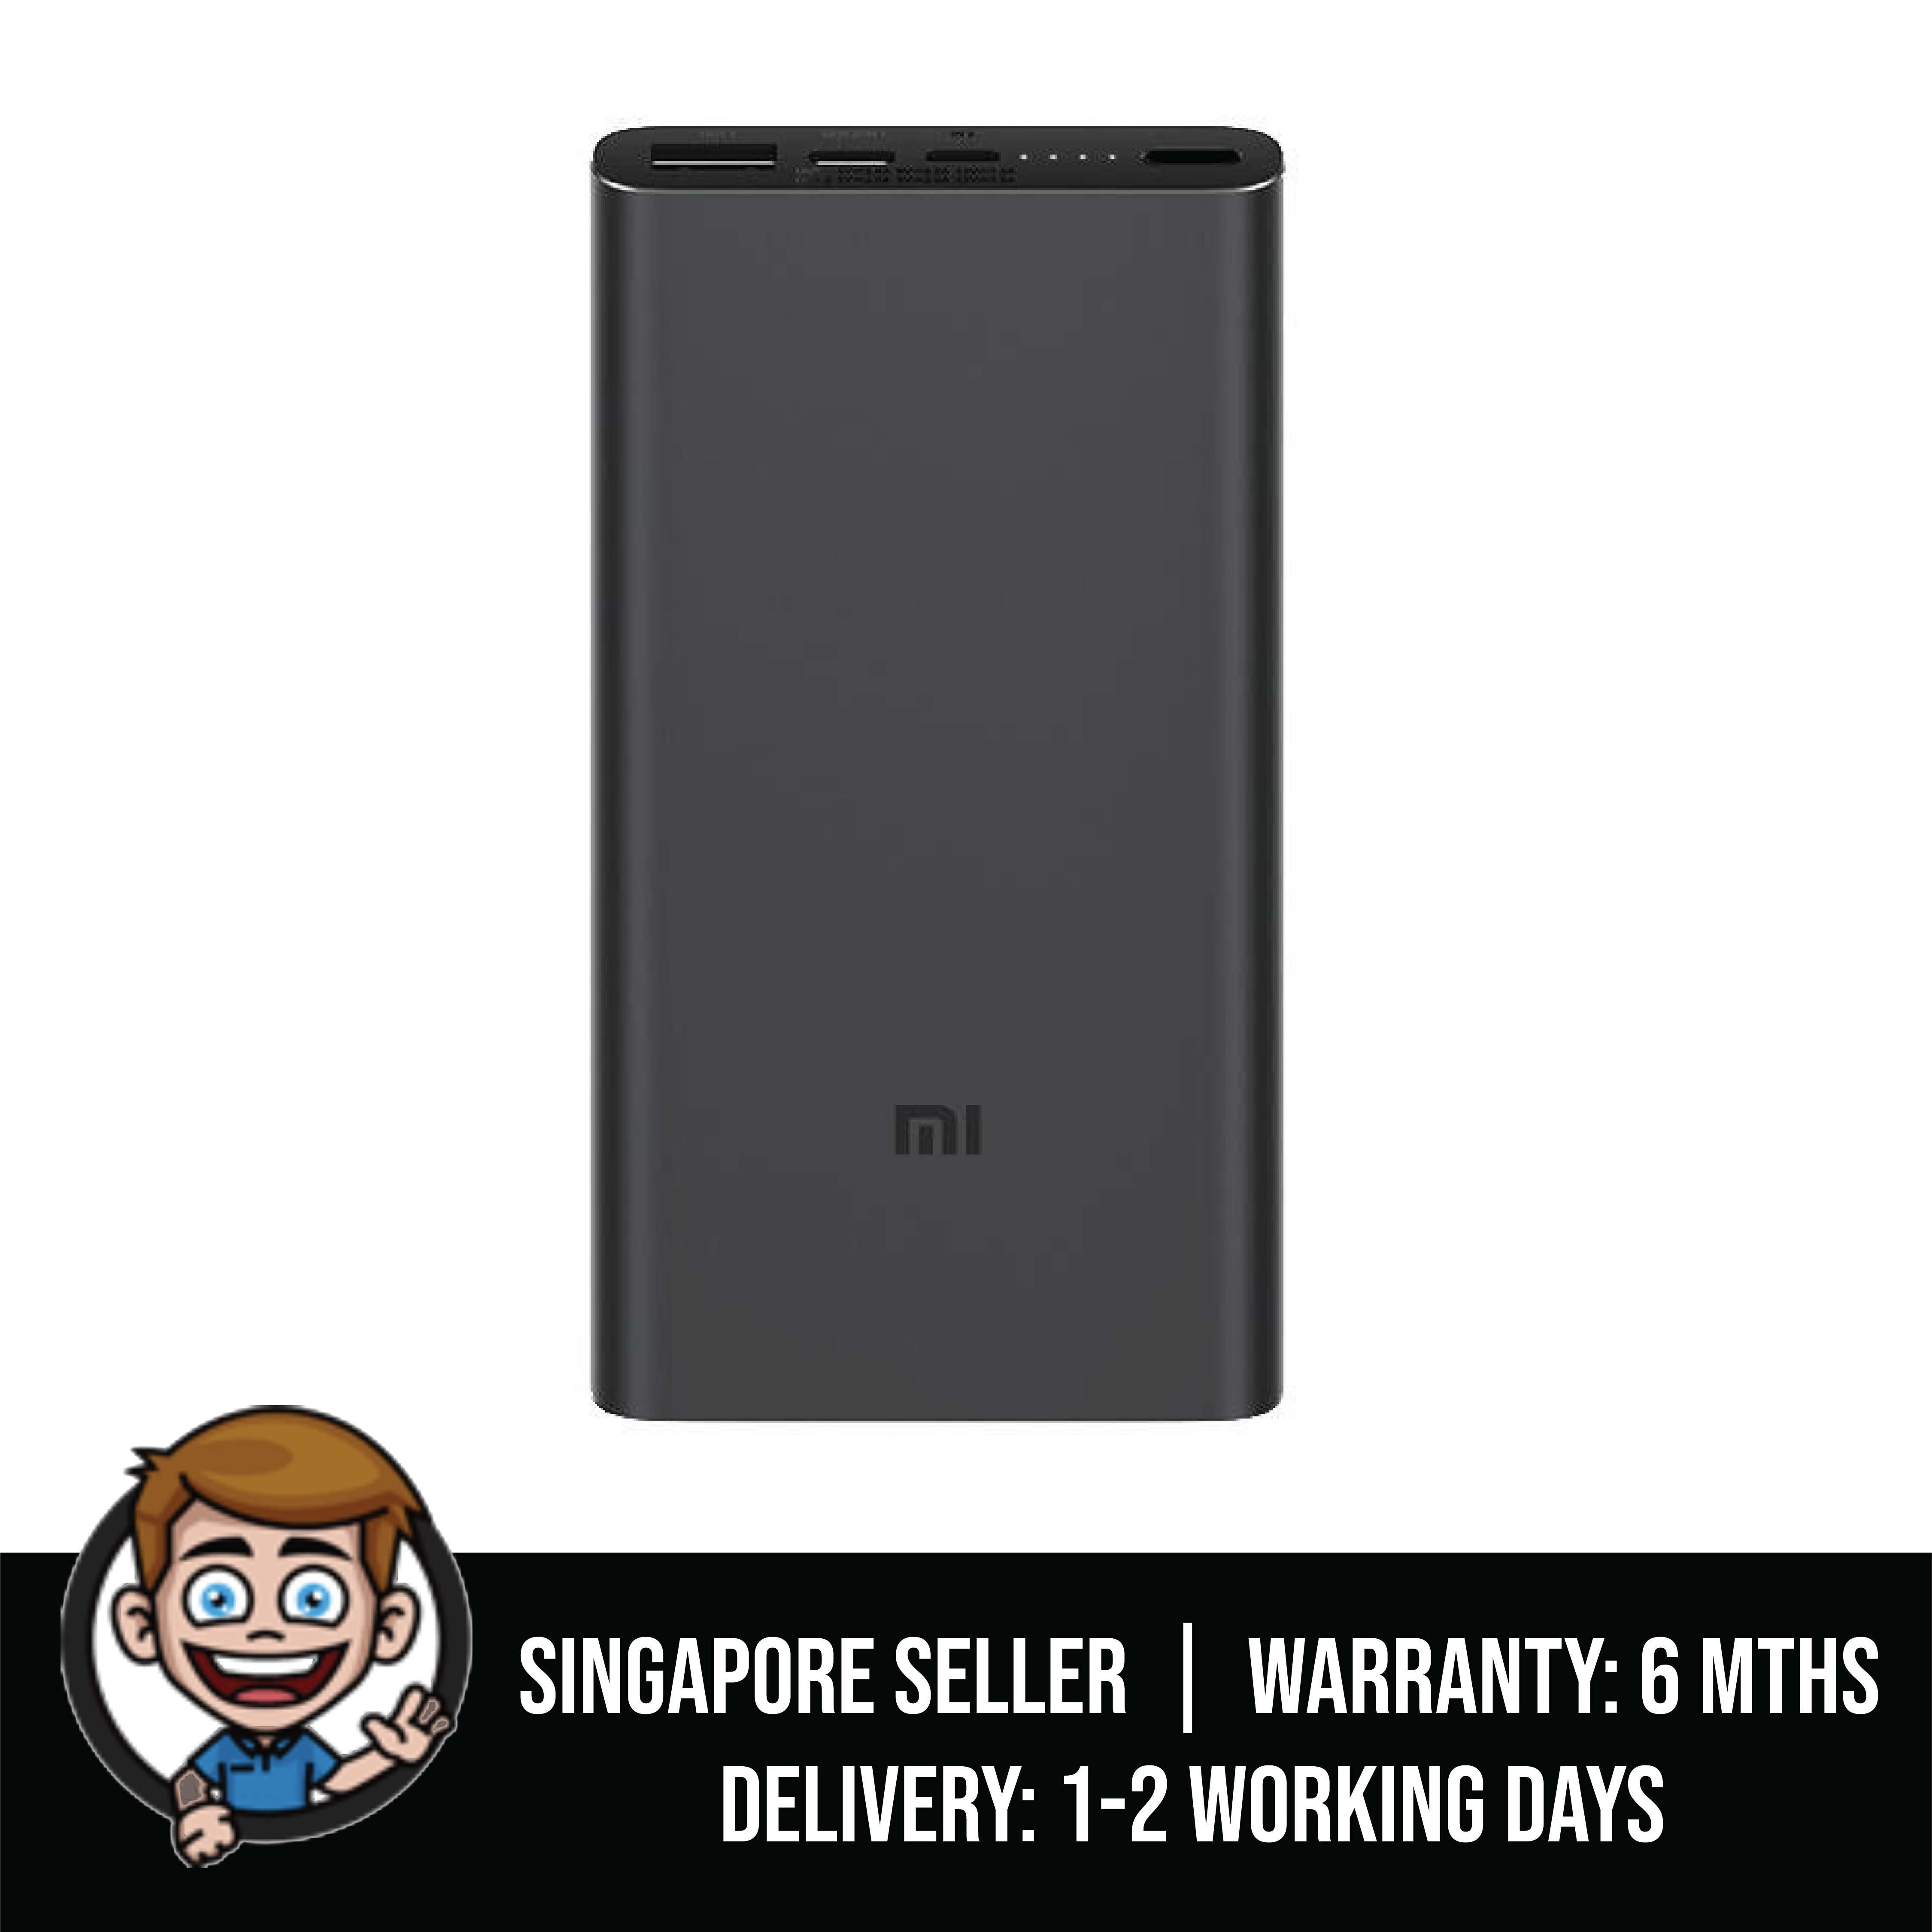 355495b616a54 Buy Xiaomi Accessories   Laptops   Lazada.sg